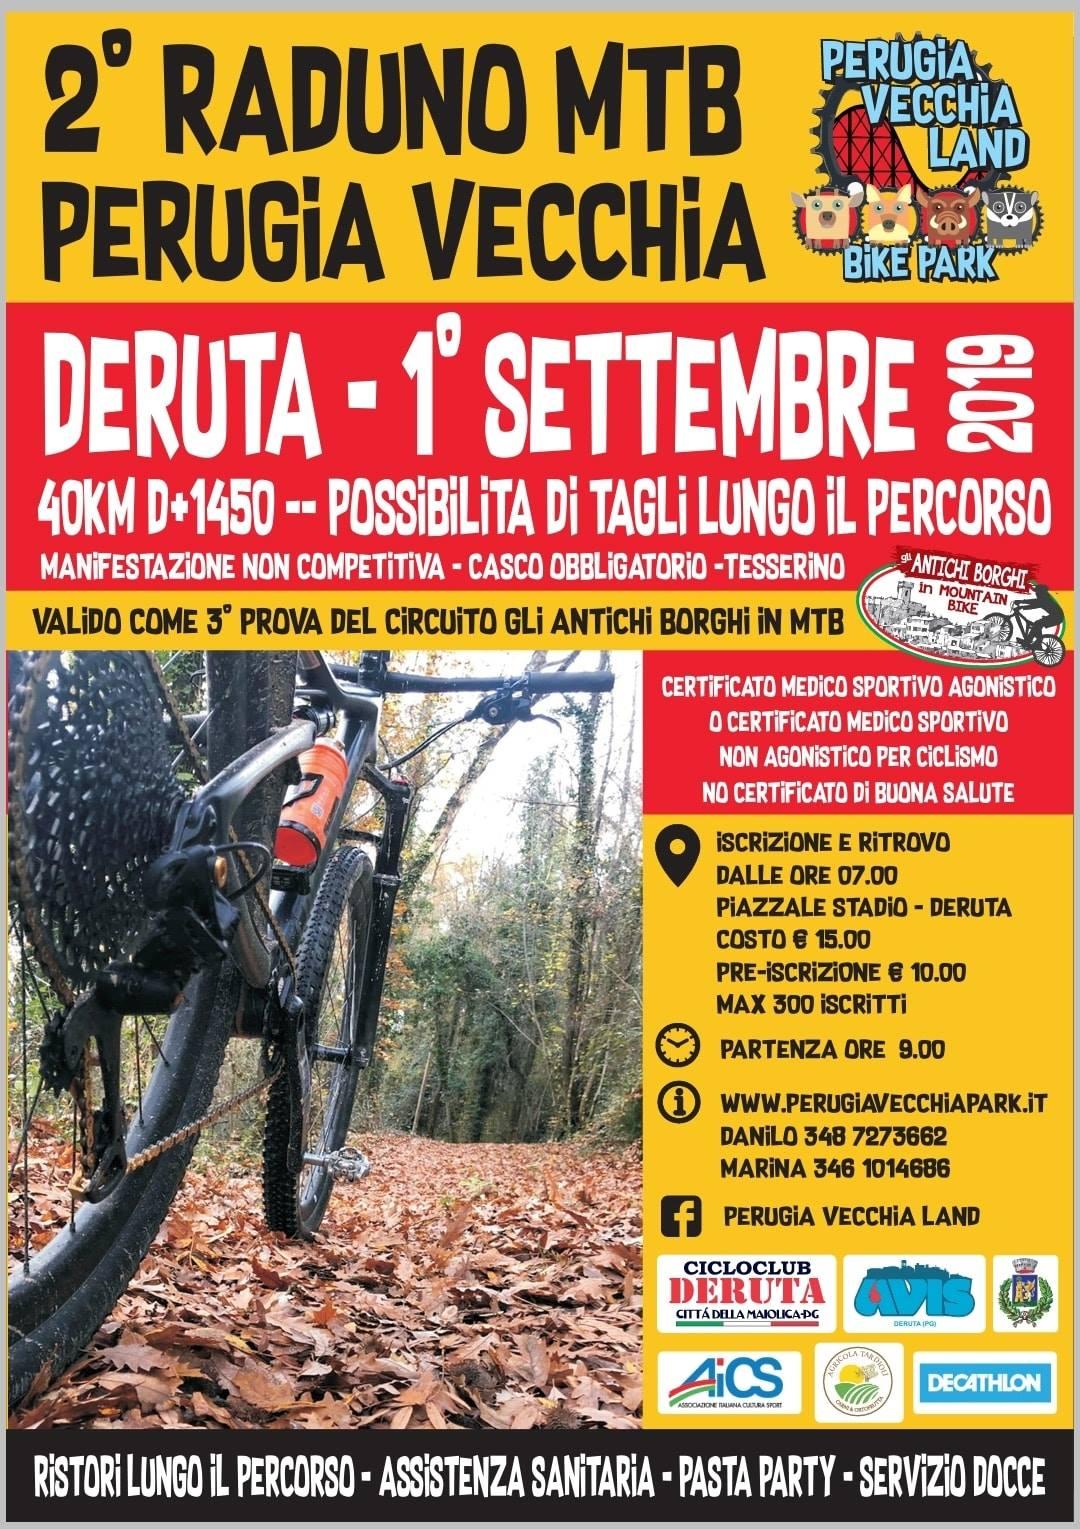 Locandina Raduno Perugia Vecchia Land 2019